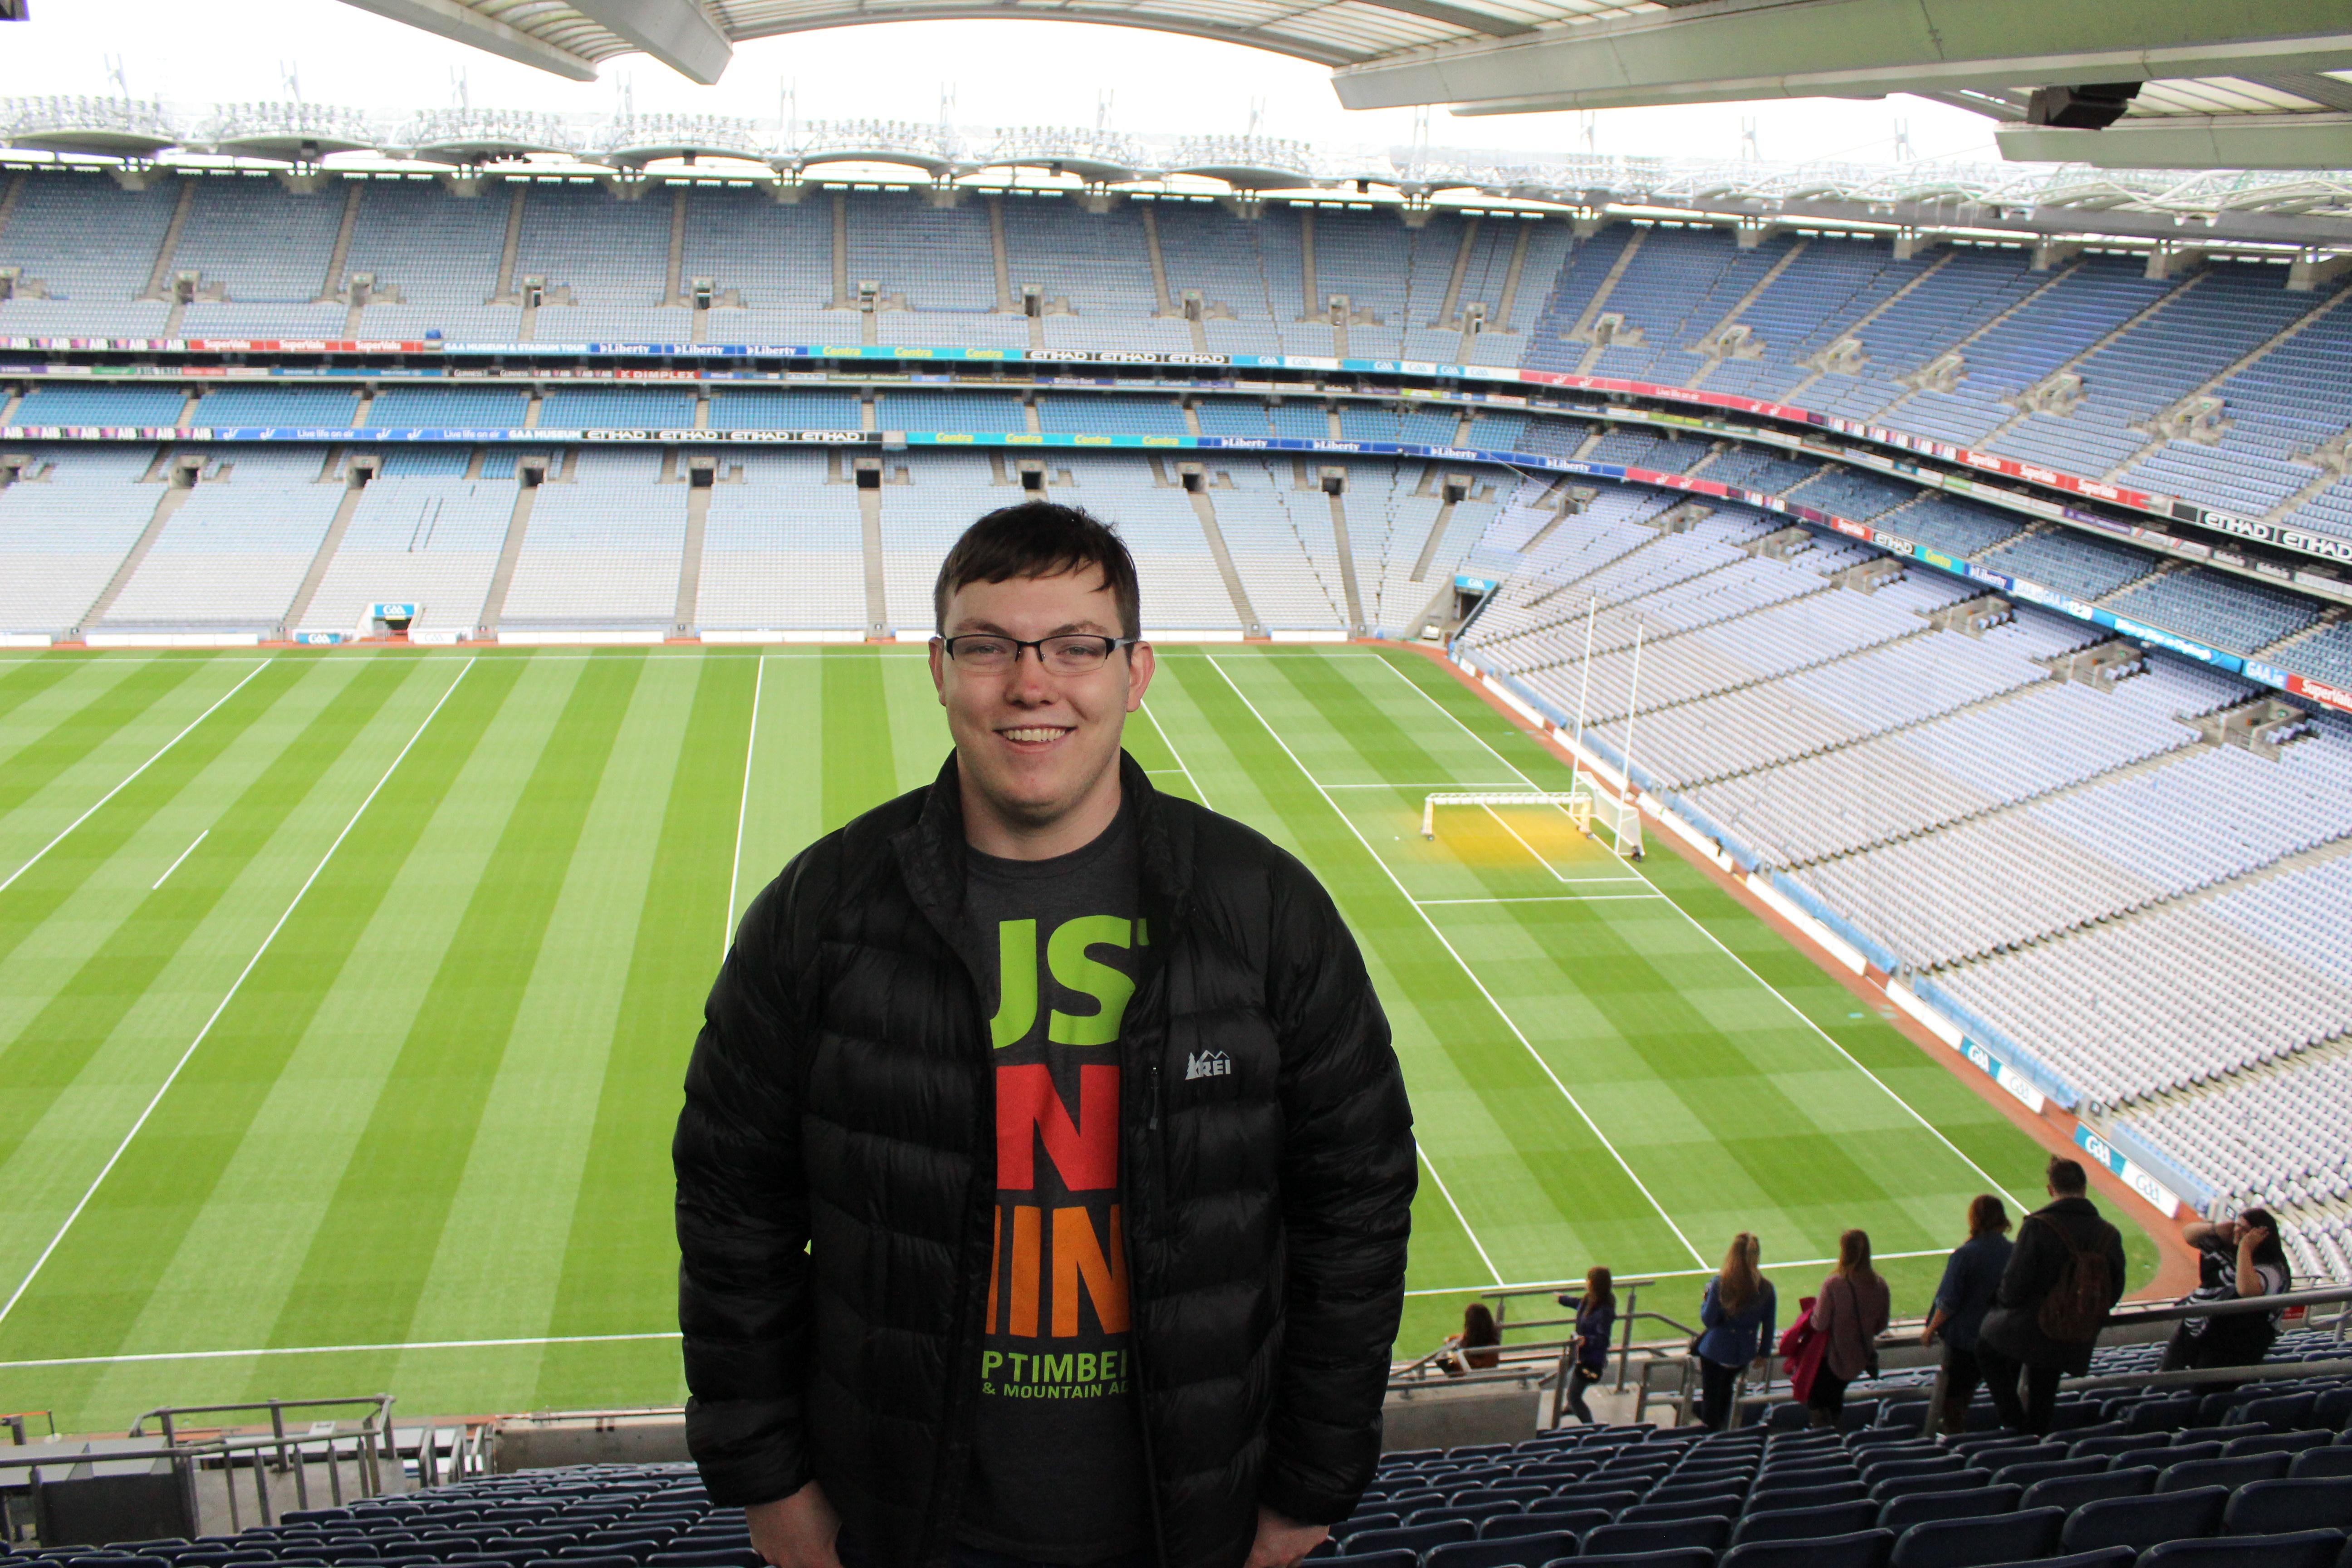 CAPAStudyAbroad_Dublin_Fall2015_From_Jeff_Vinton_-_Croke_Park_-_home_of_GAA_sports_the_week_of_GAA_final.jpg